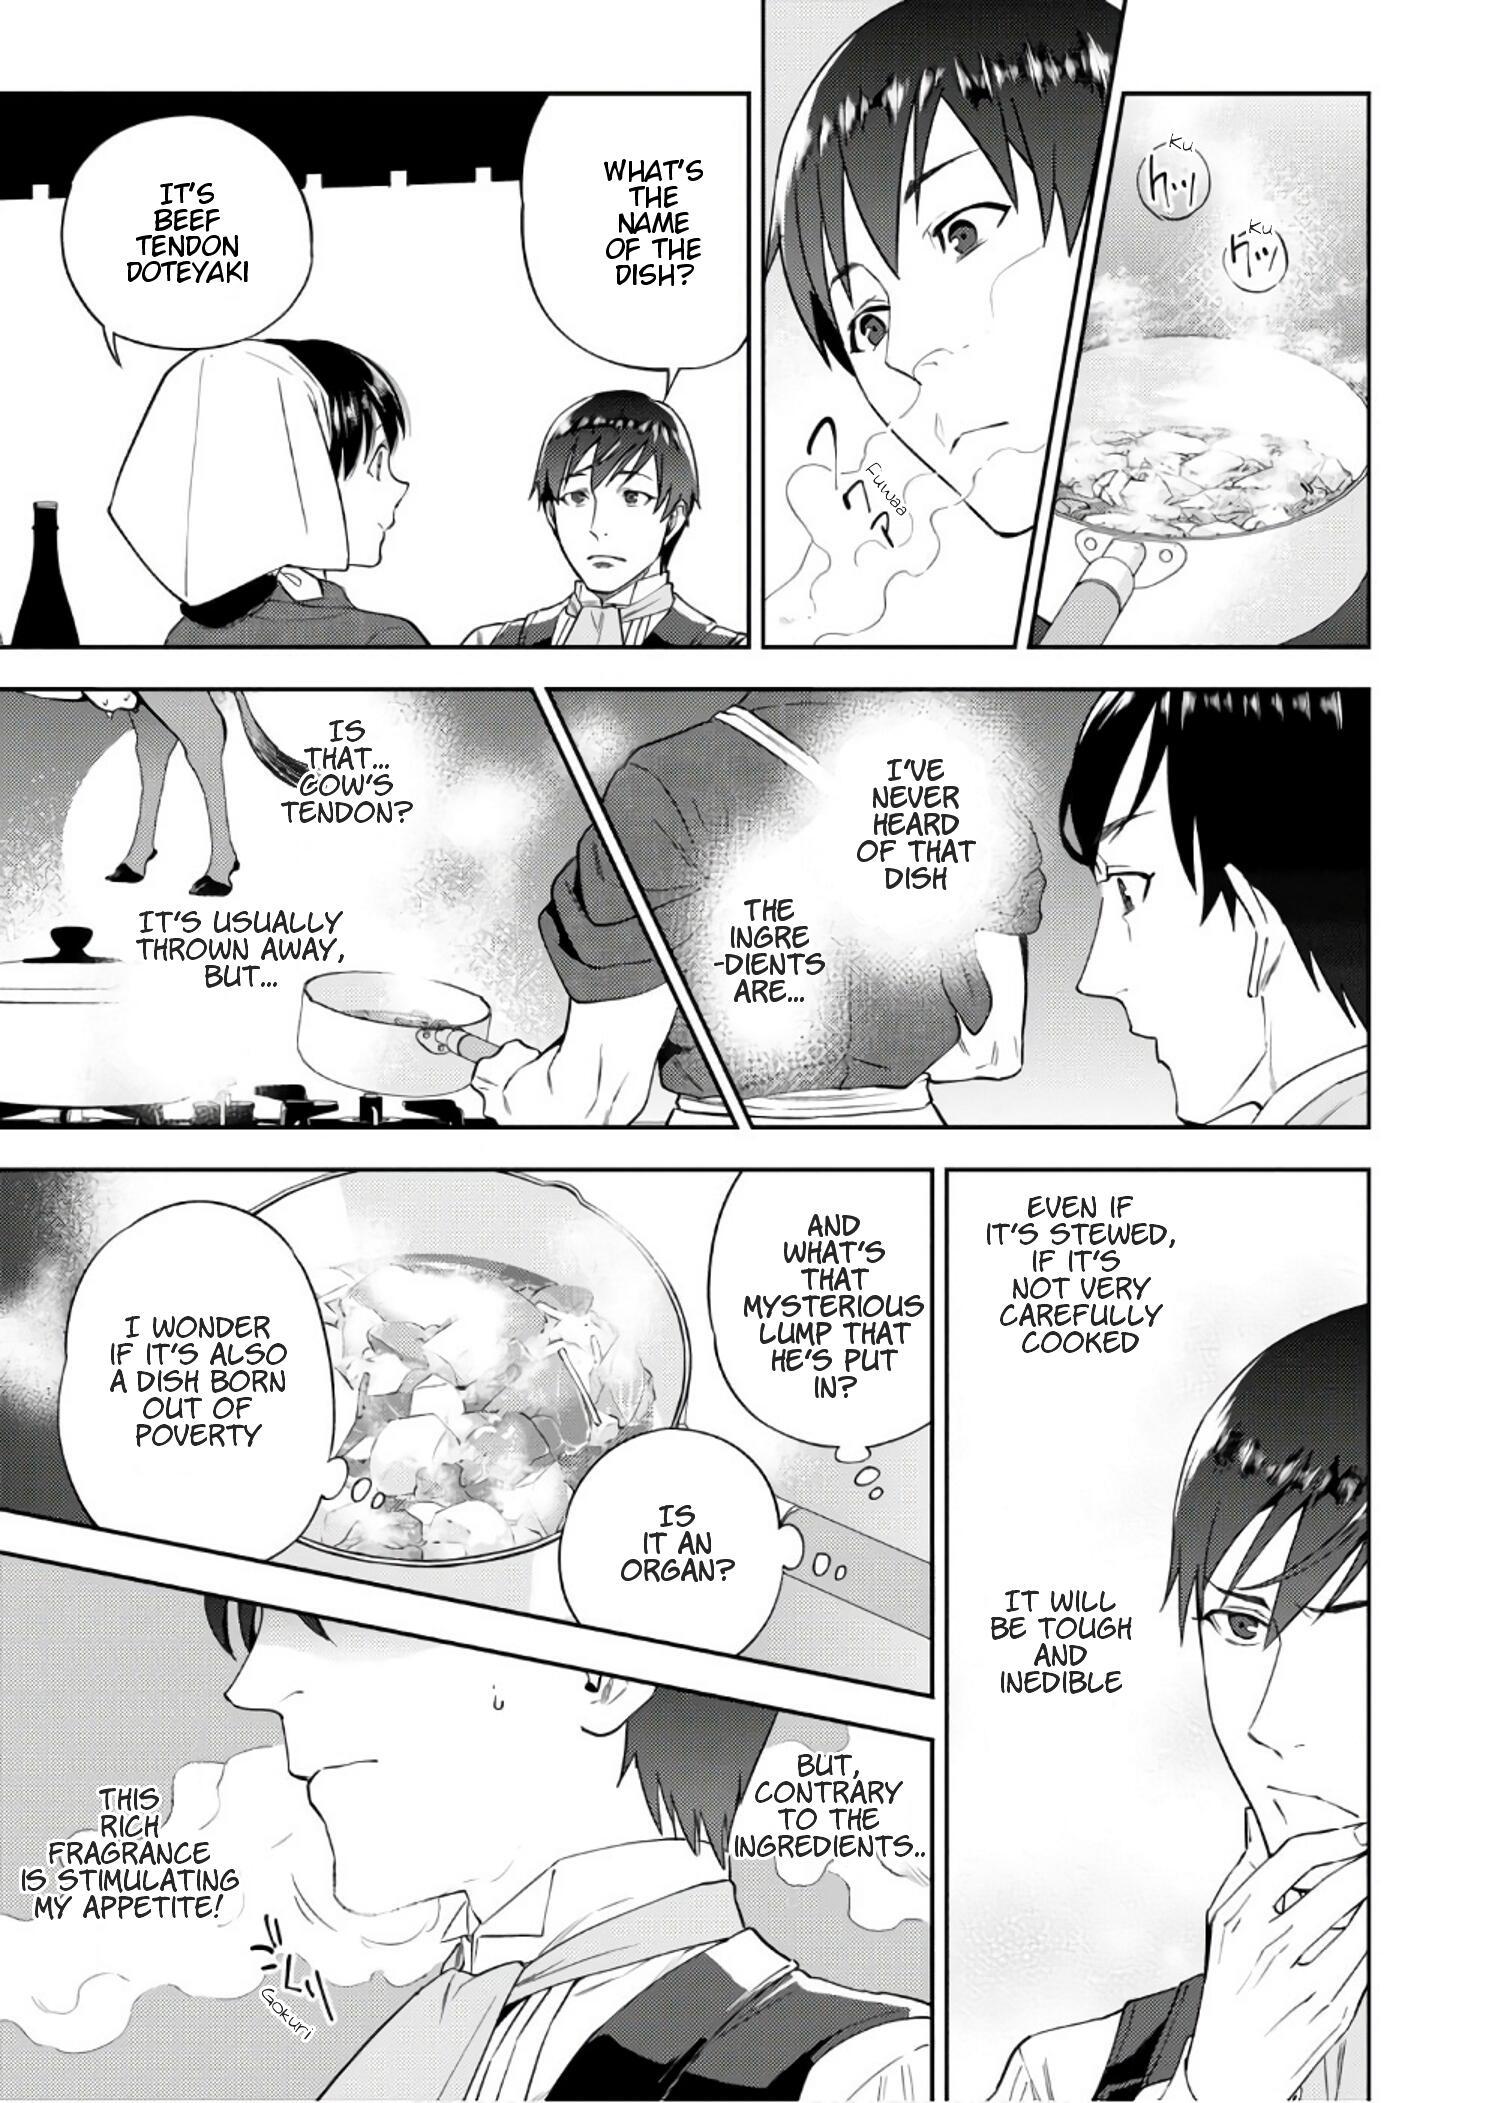 Isekai Izakaya Vol.6 Chapter 36: Beef Tendon Doteyaki page 18 - Mangakakalots.com